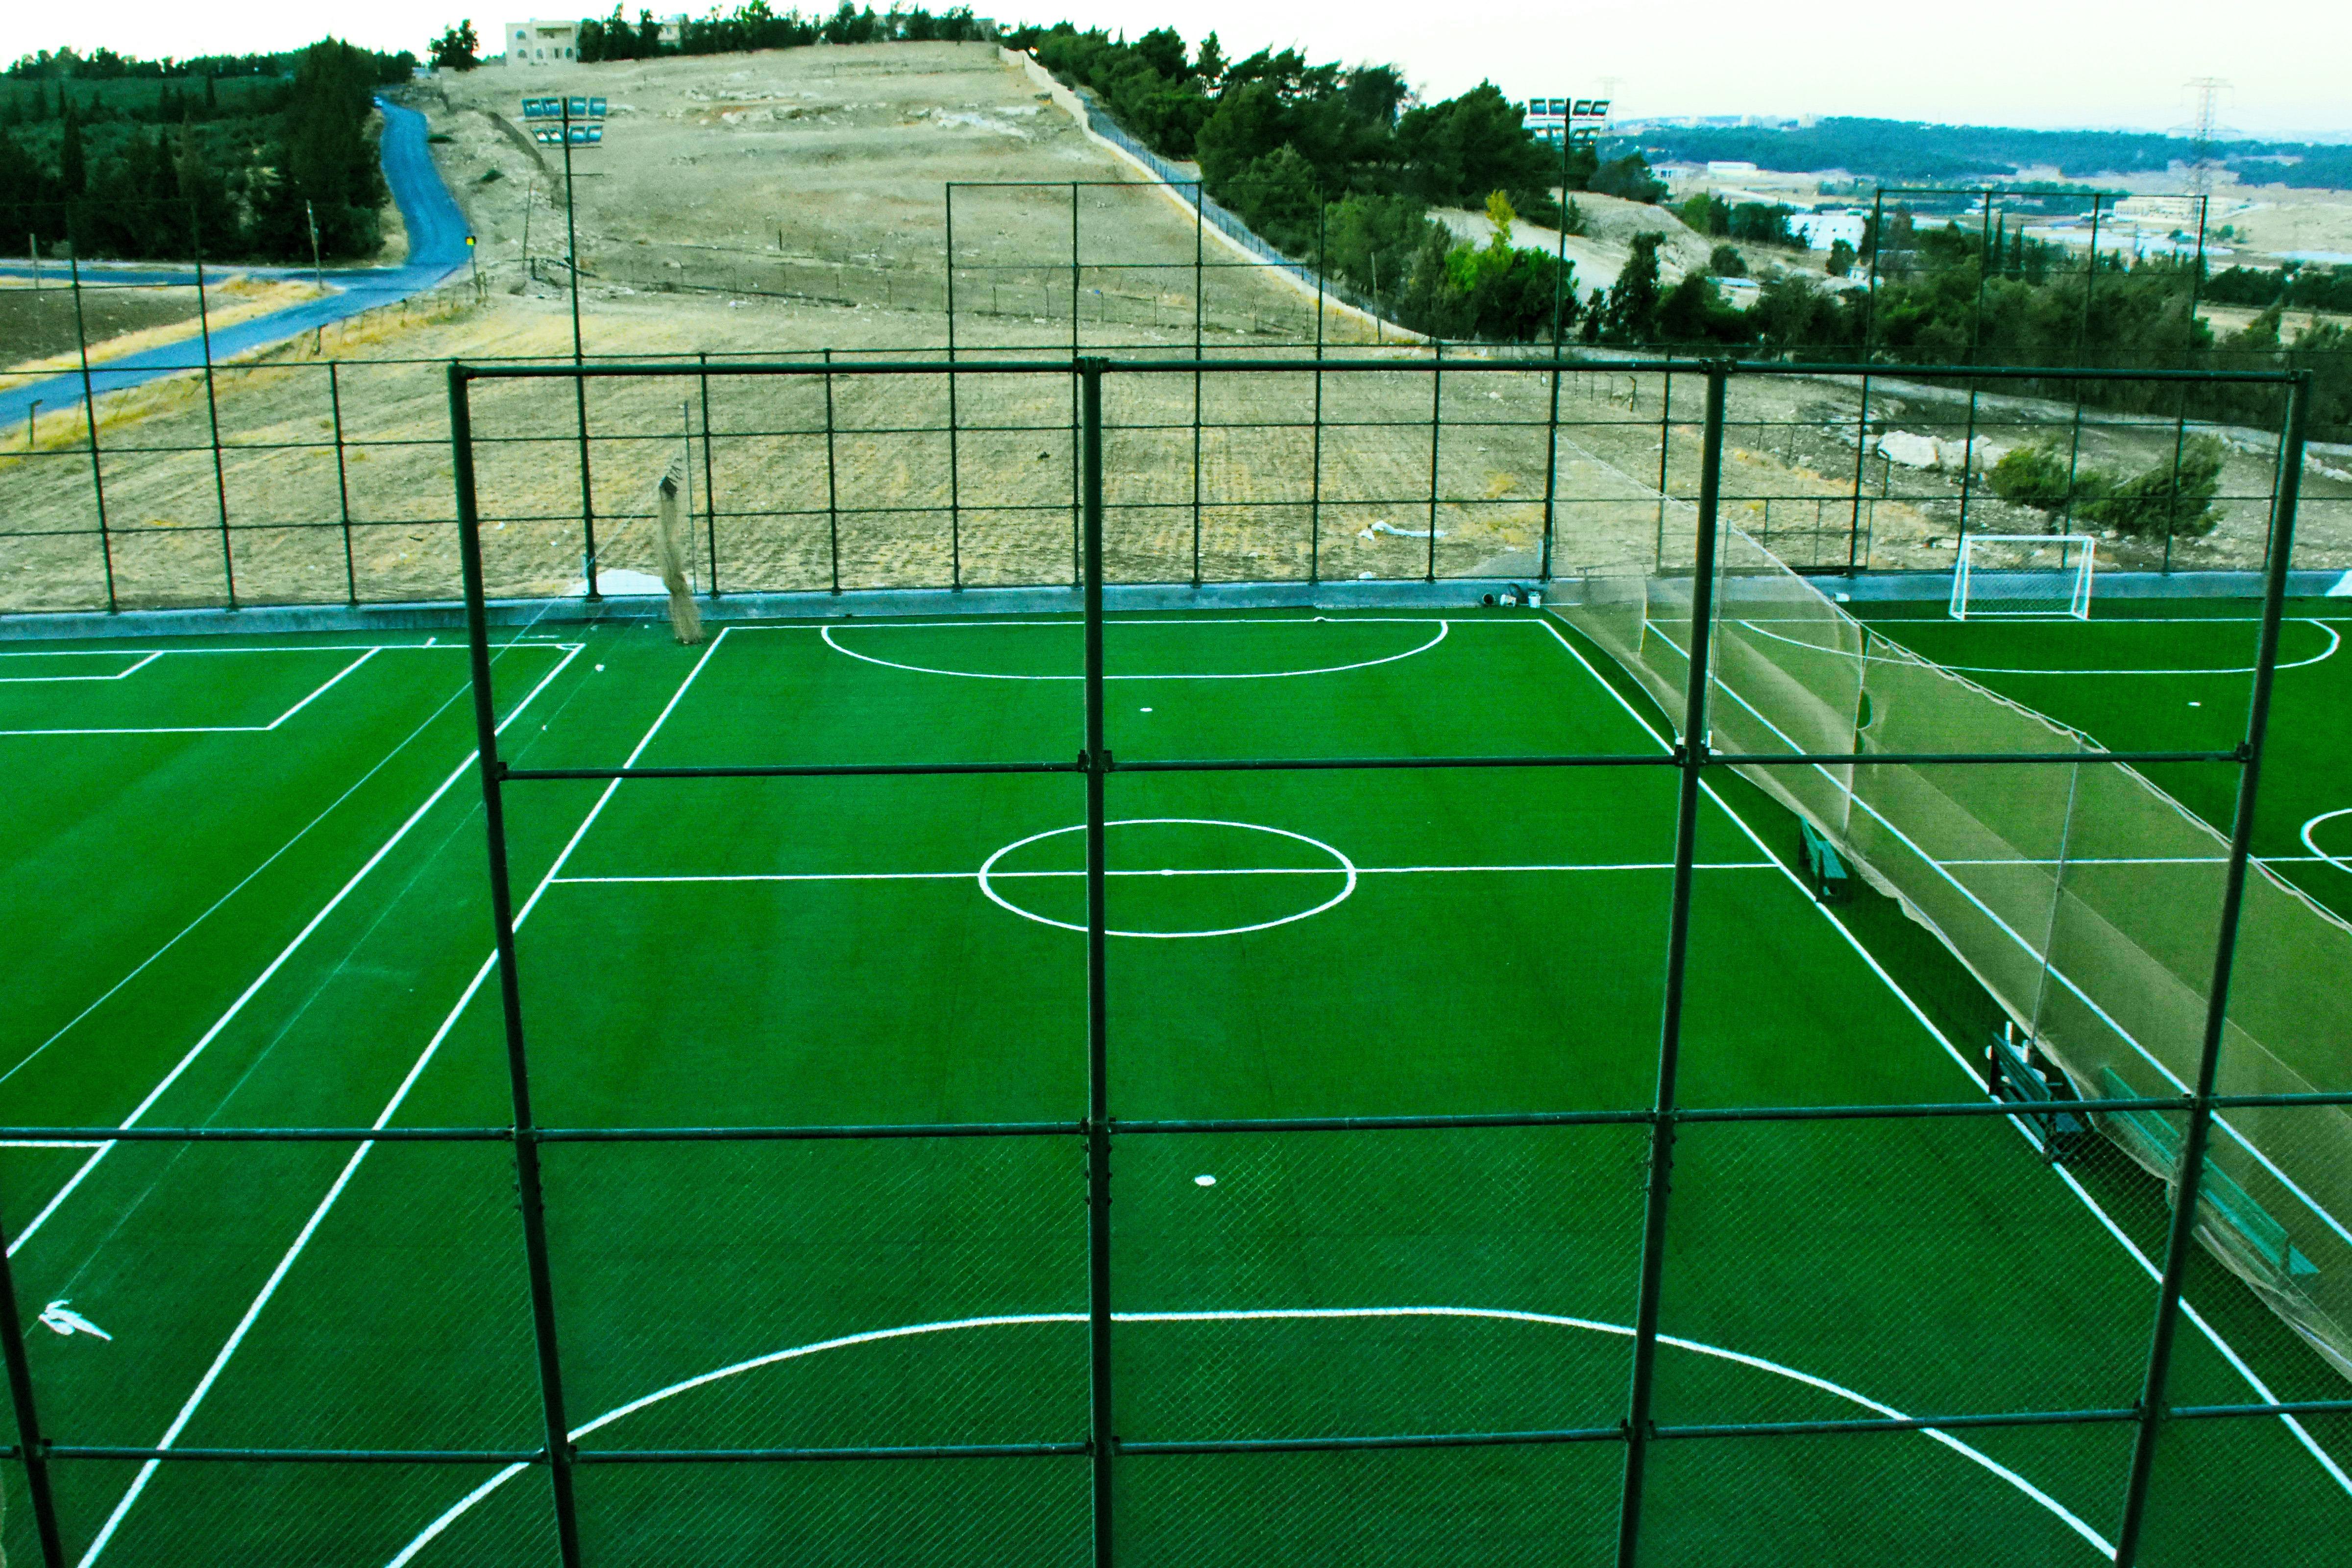 outdoor football field 6yard amman